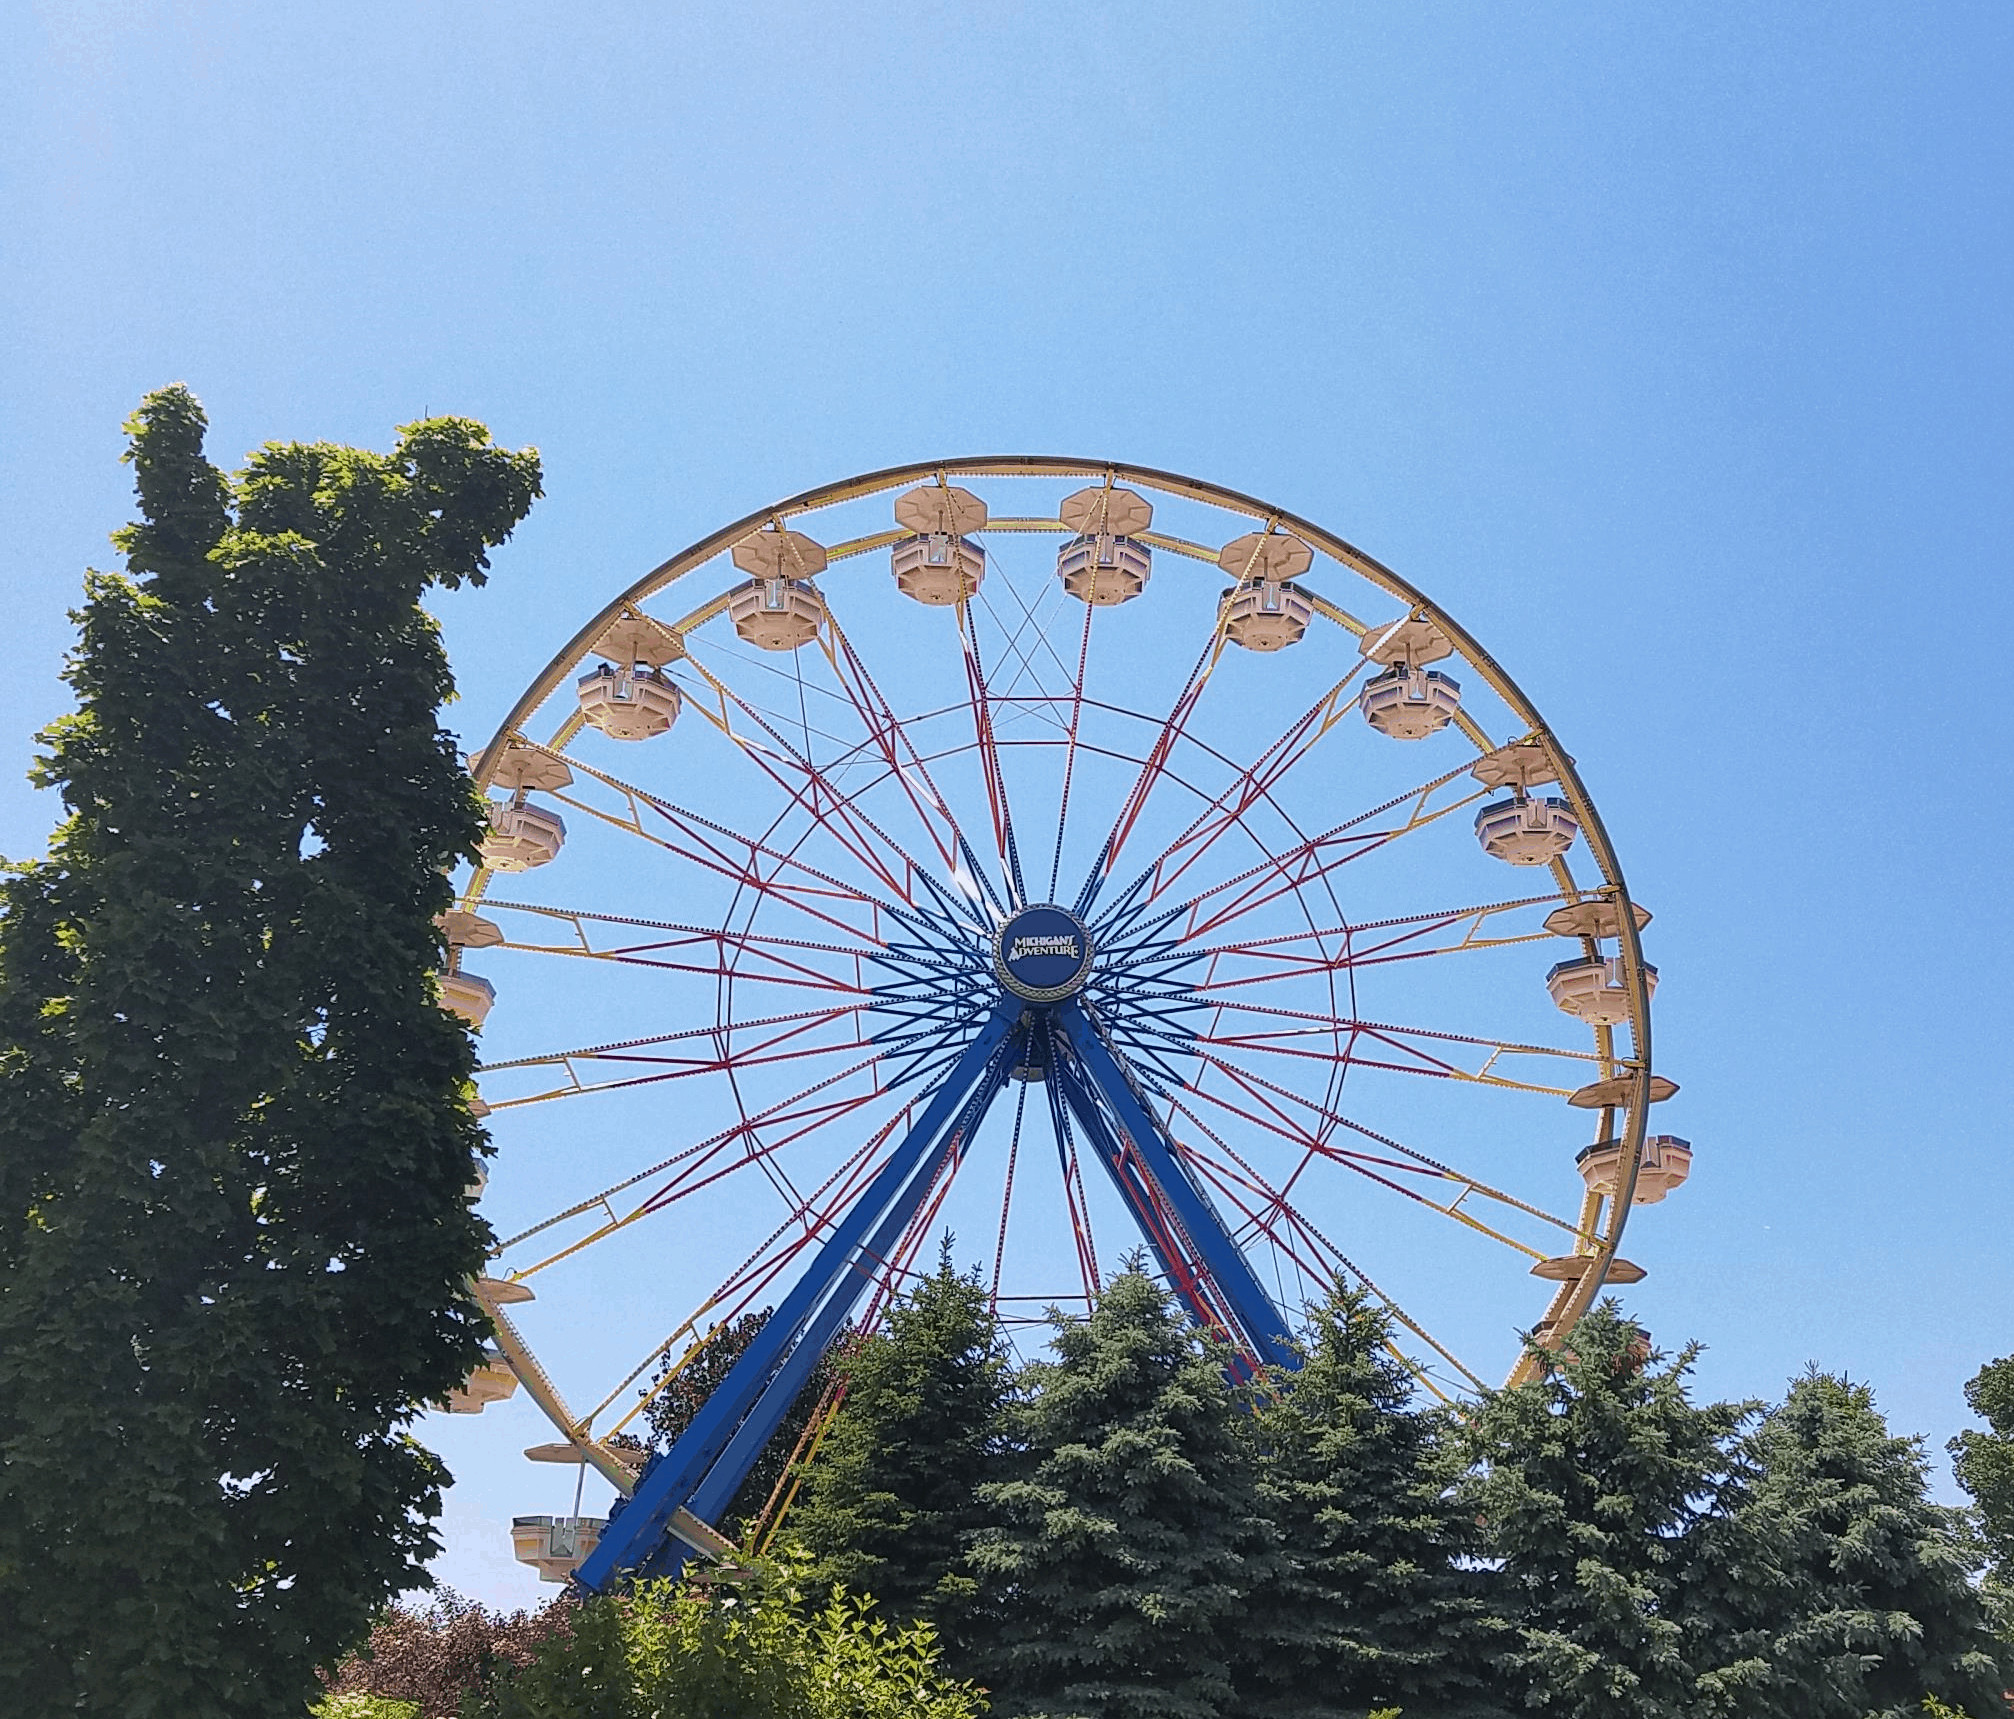 Michigan adventure ferris wheel